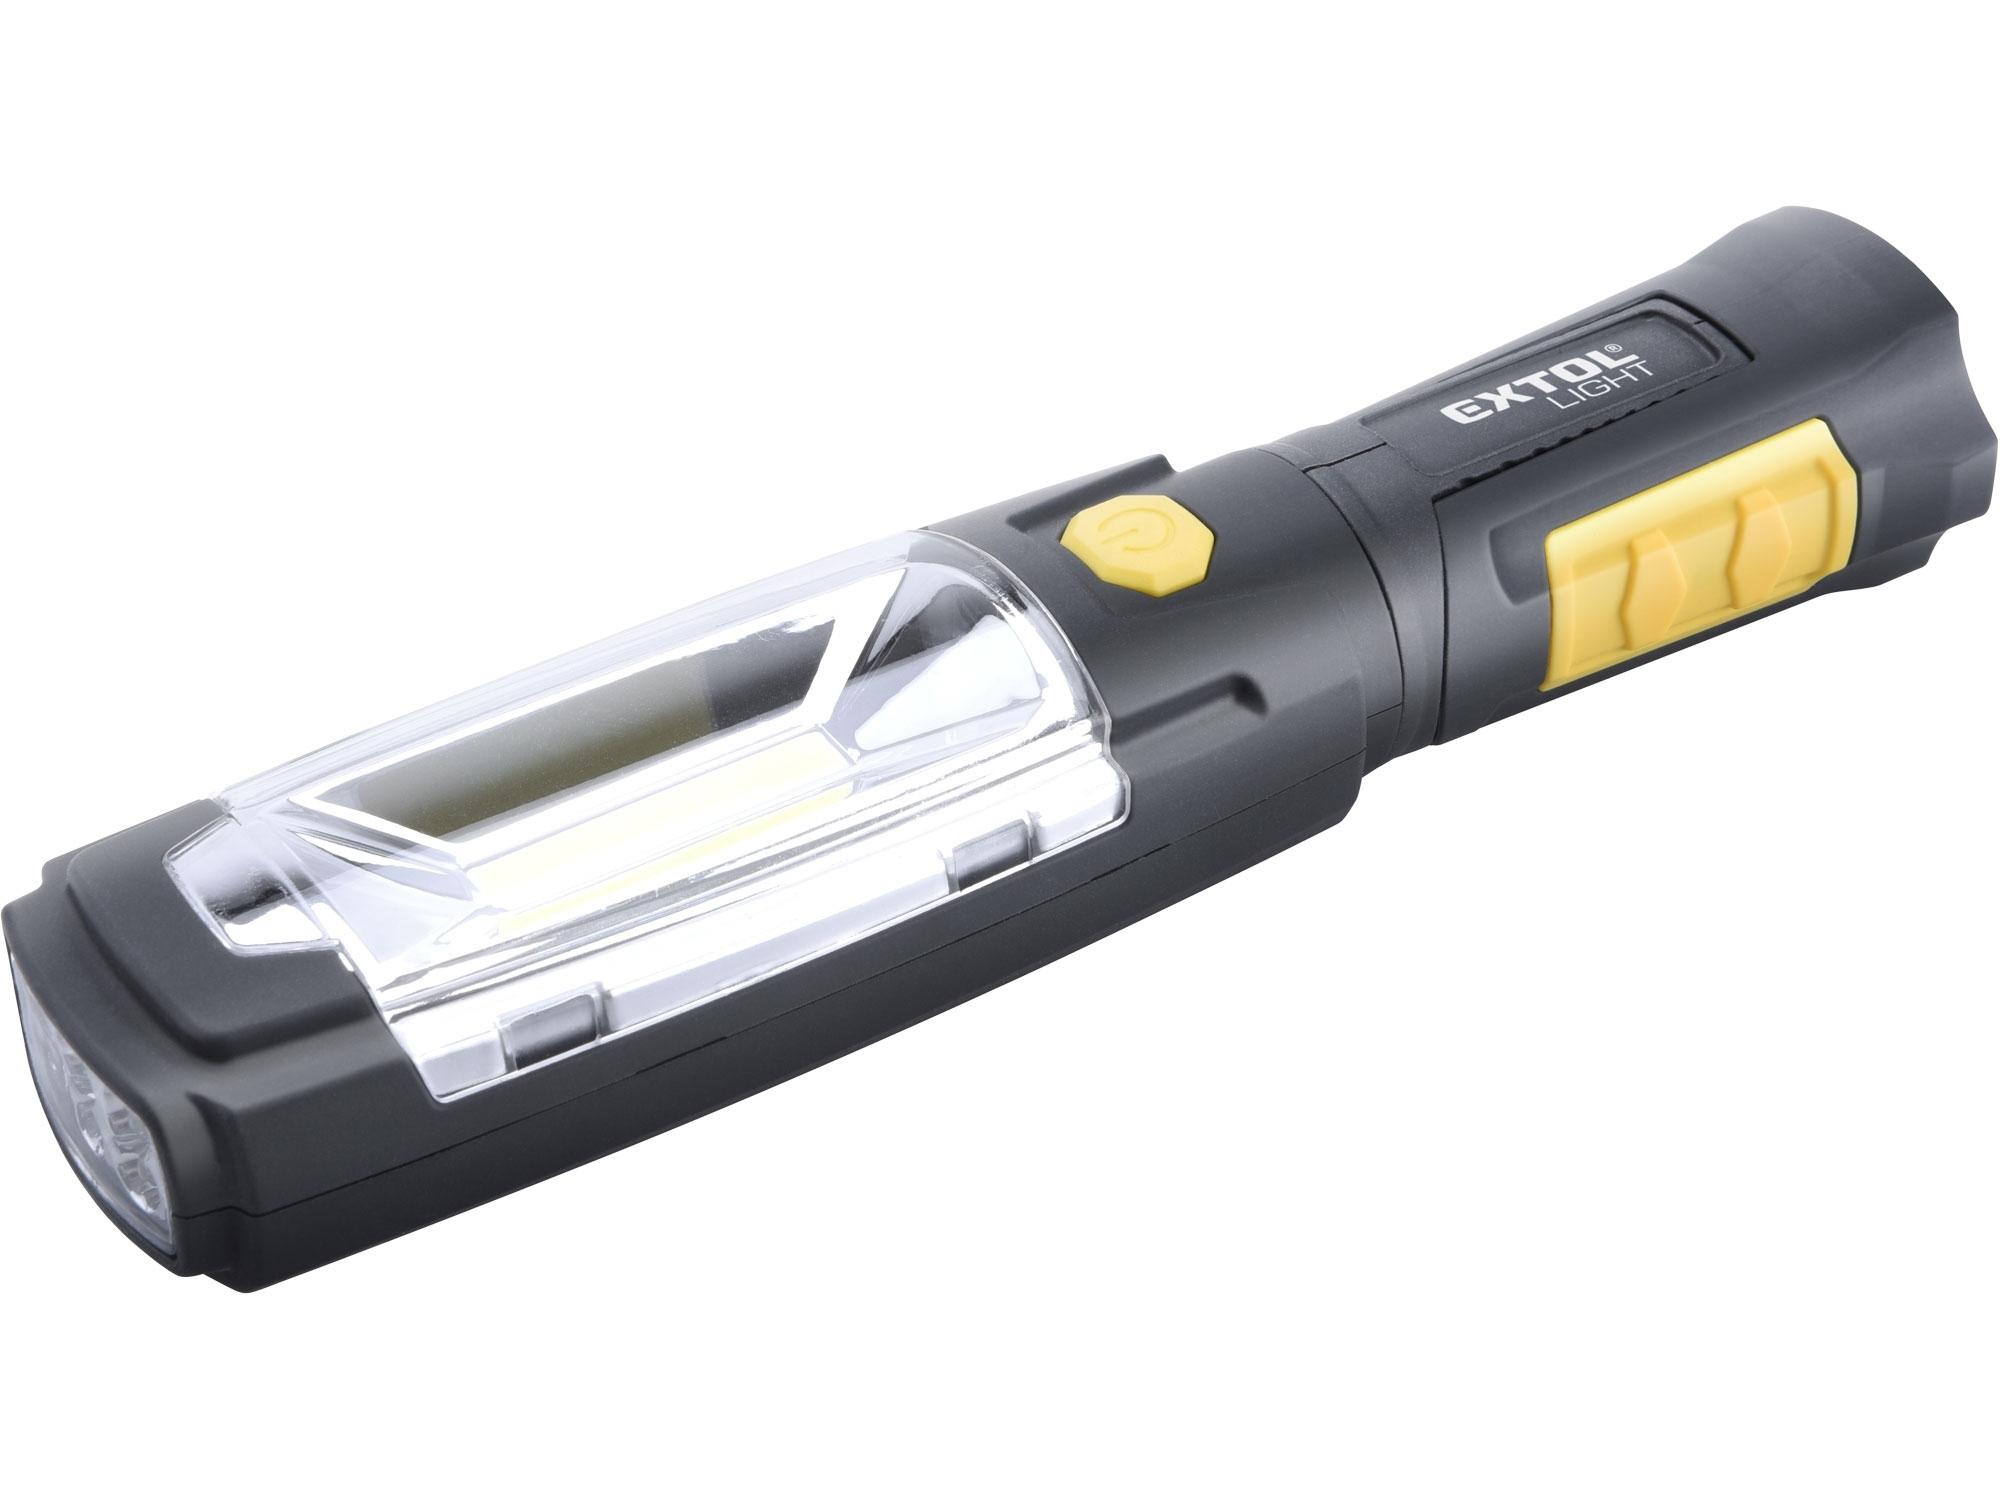 svítilna kloubová 280lm COB LED, 3W COB LED, 6x30lm LED